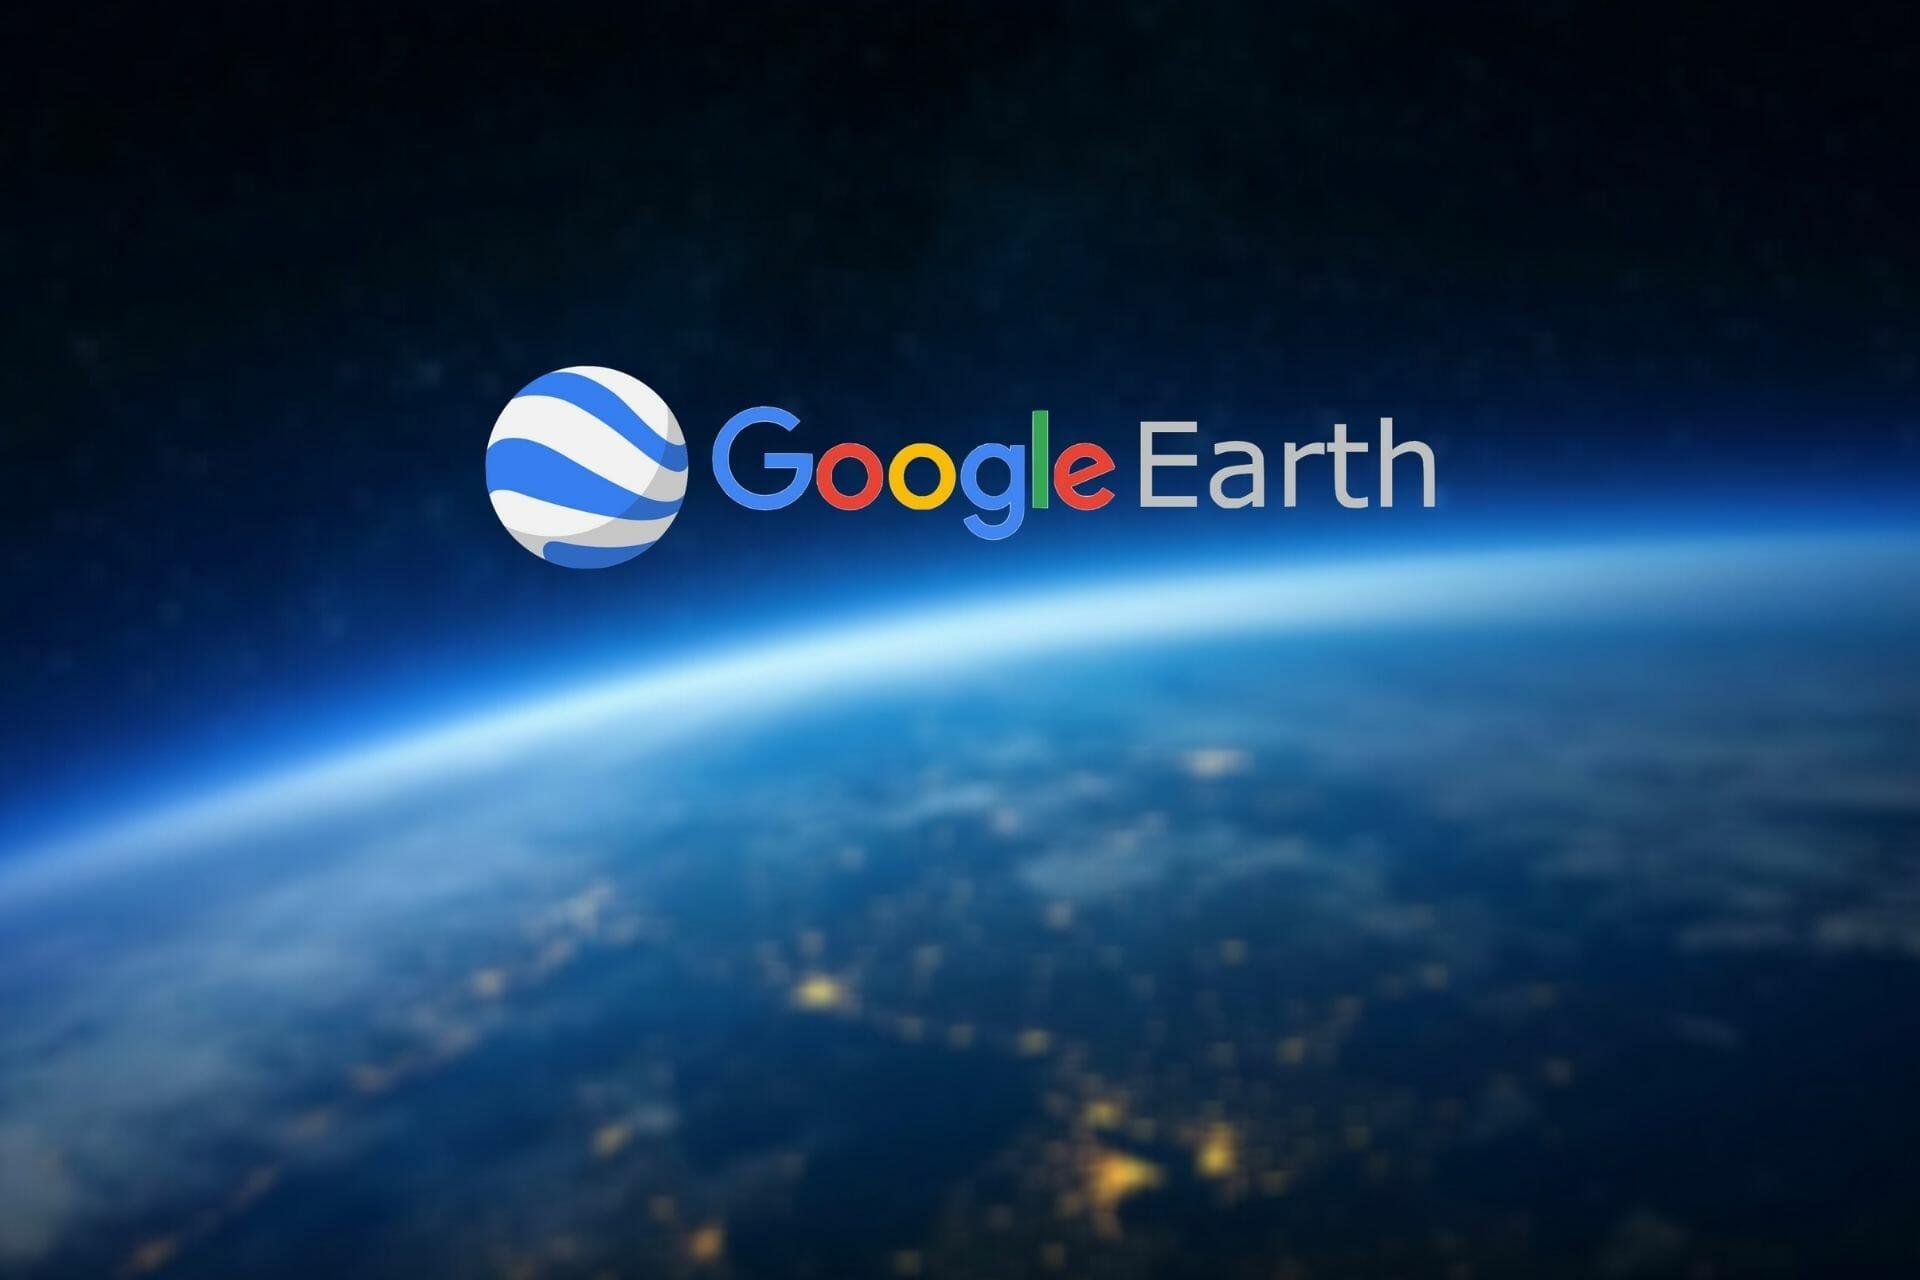 Google Earth server error